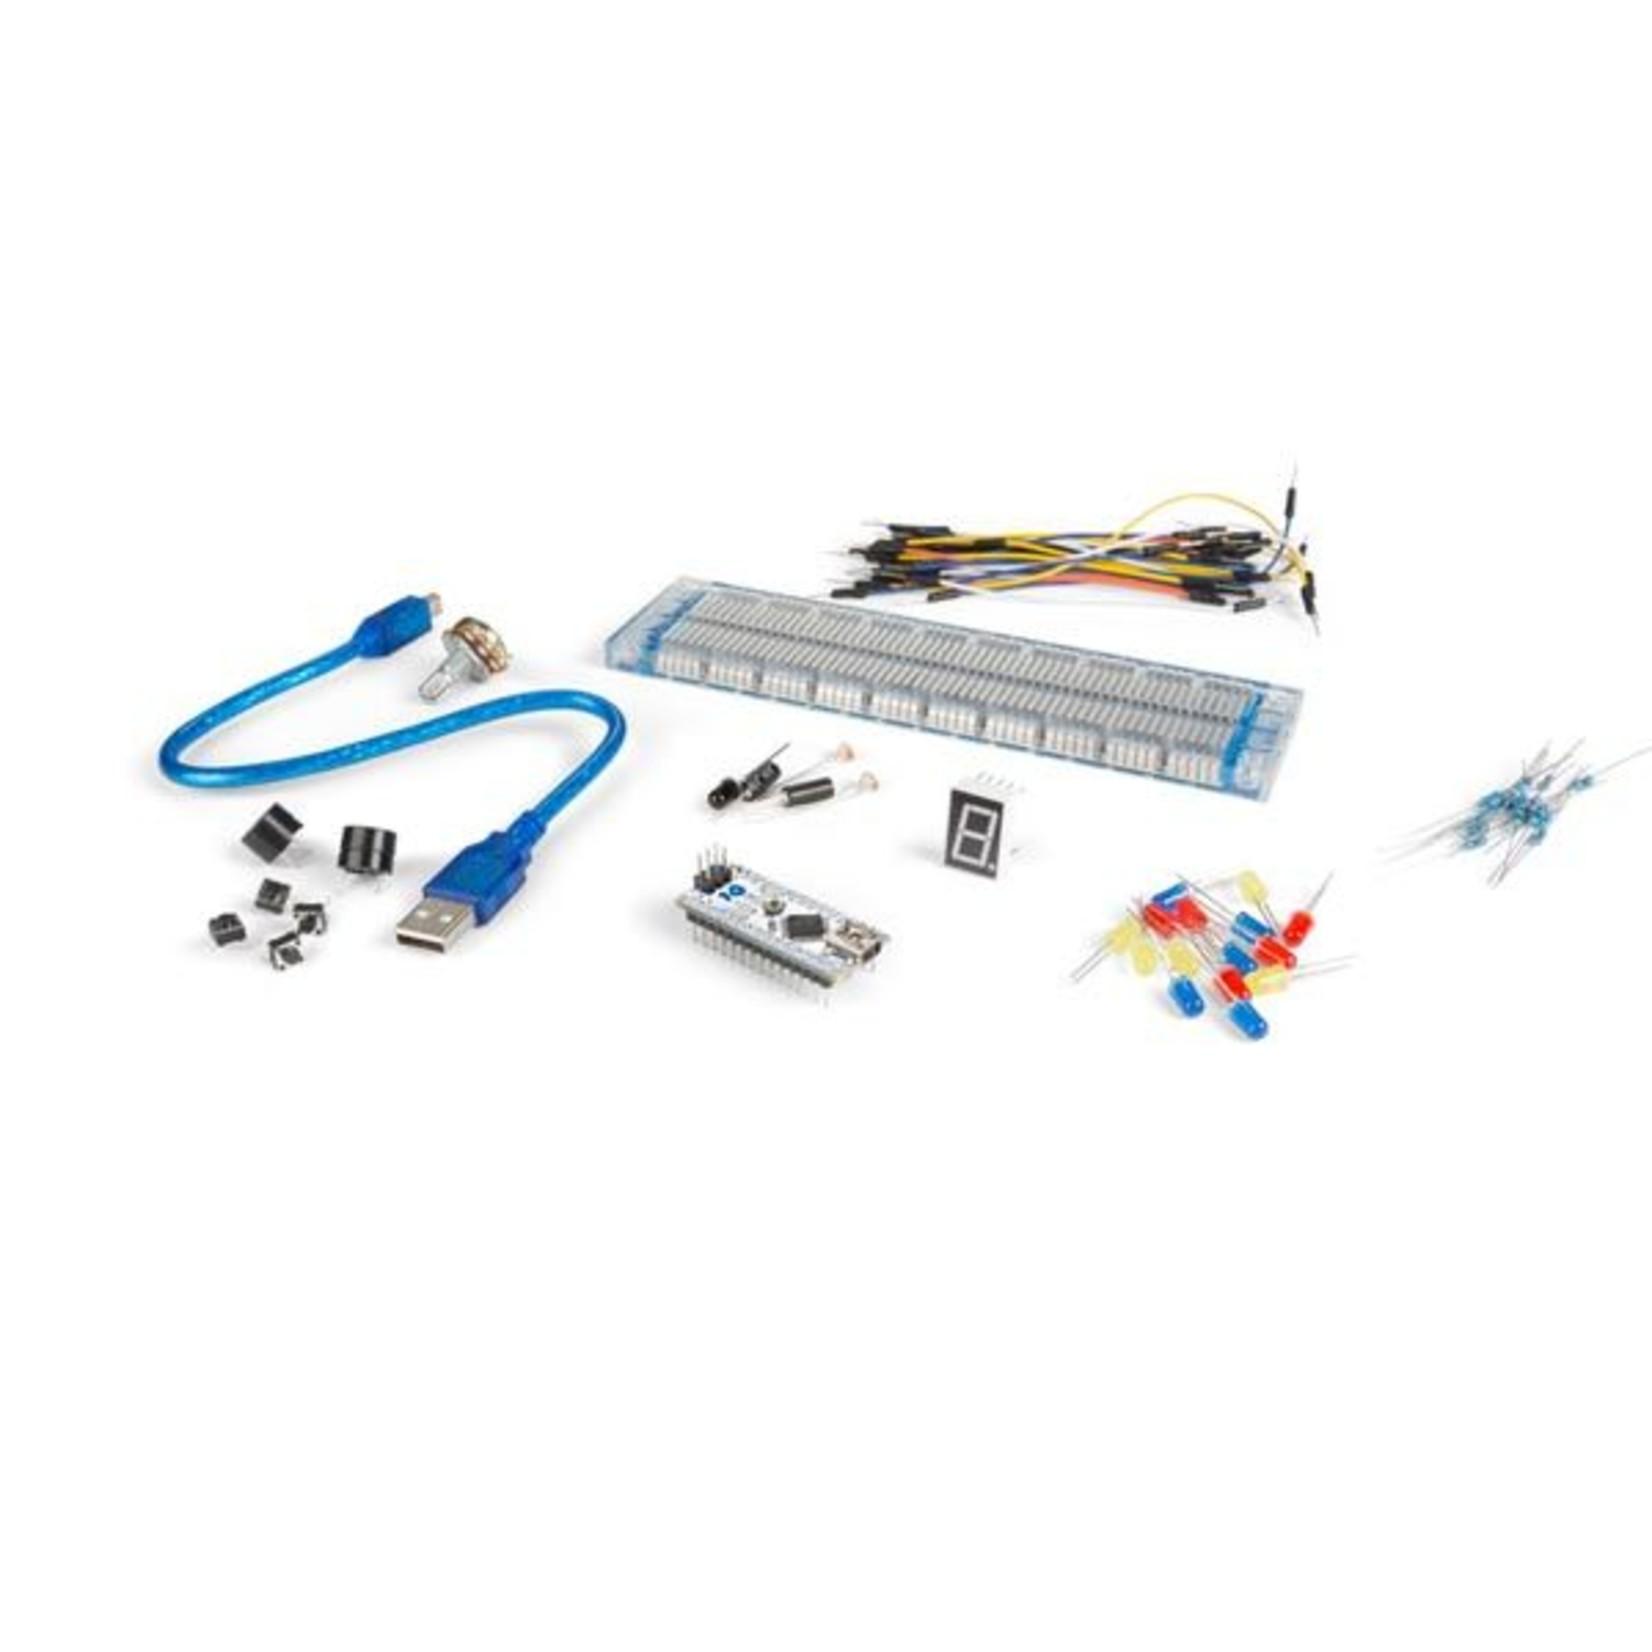 Velleman Basic ARDUINO®  compatible experimenter's kit